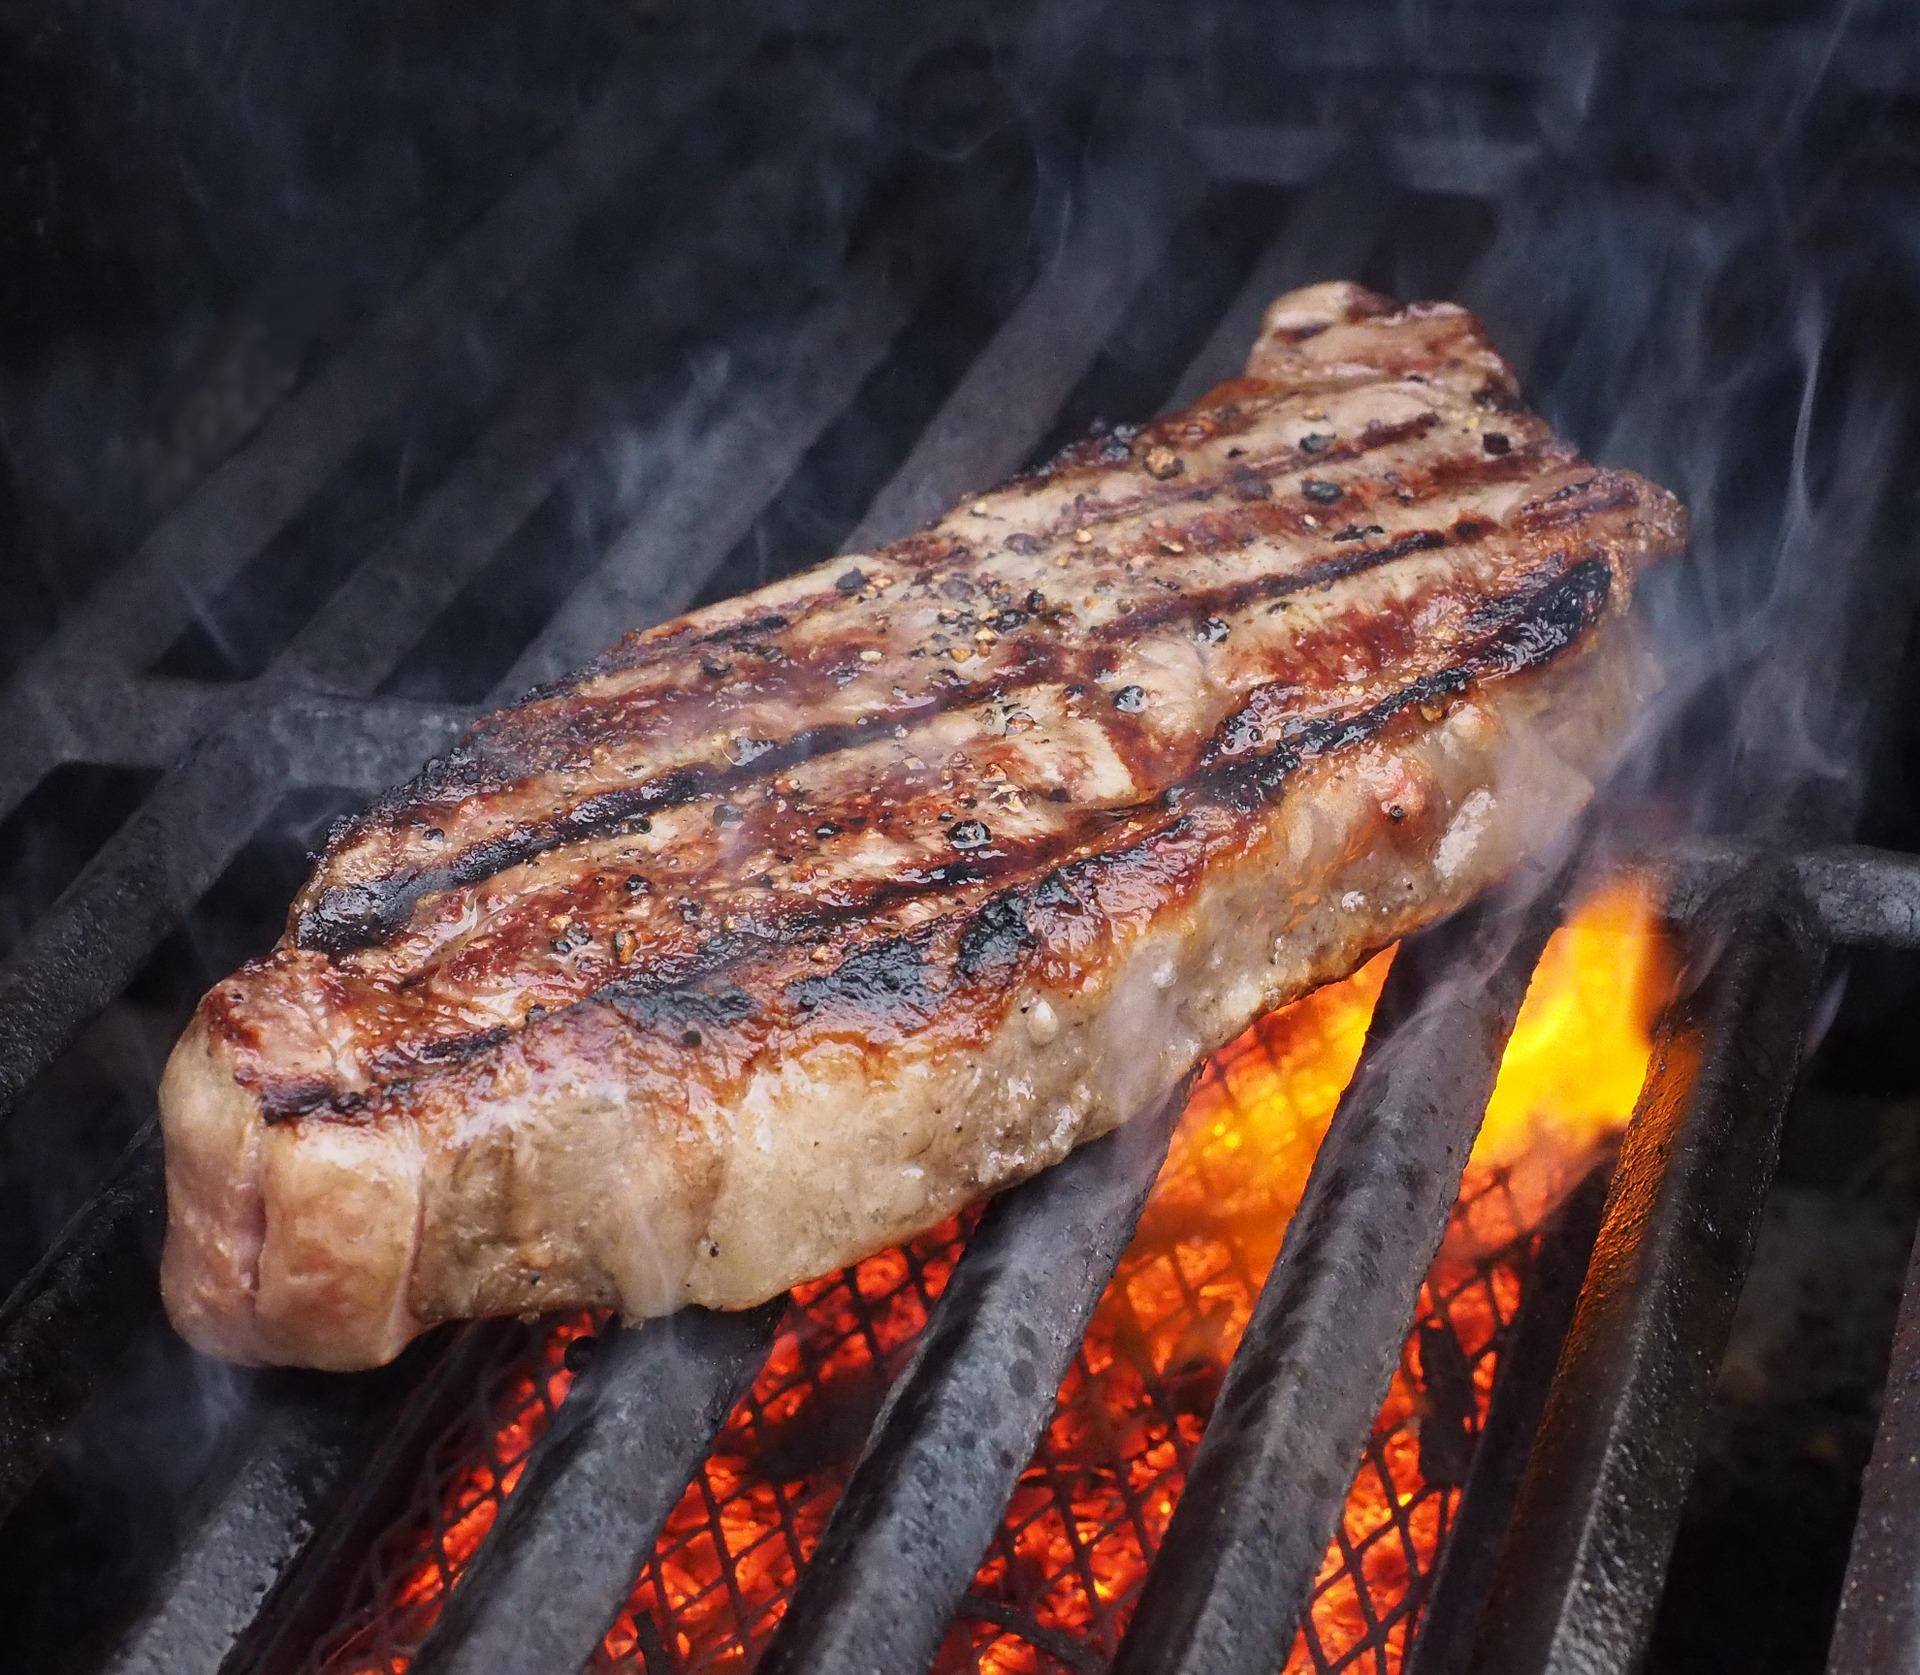 steak 10766651920